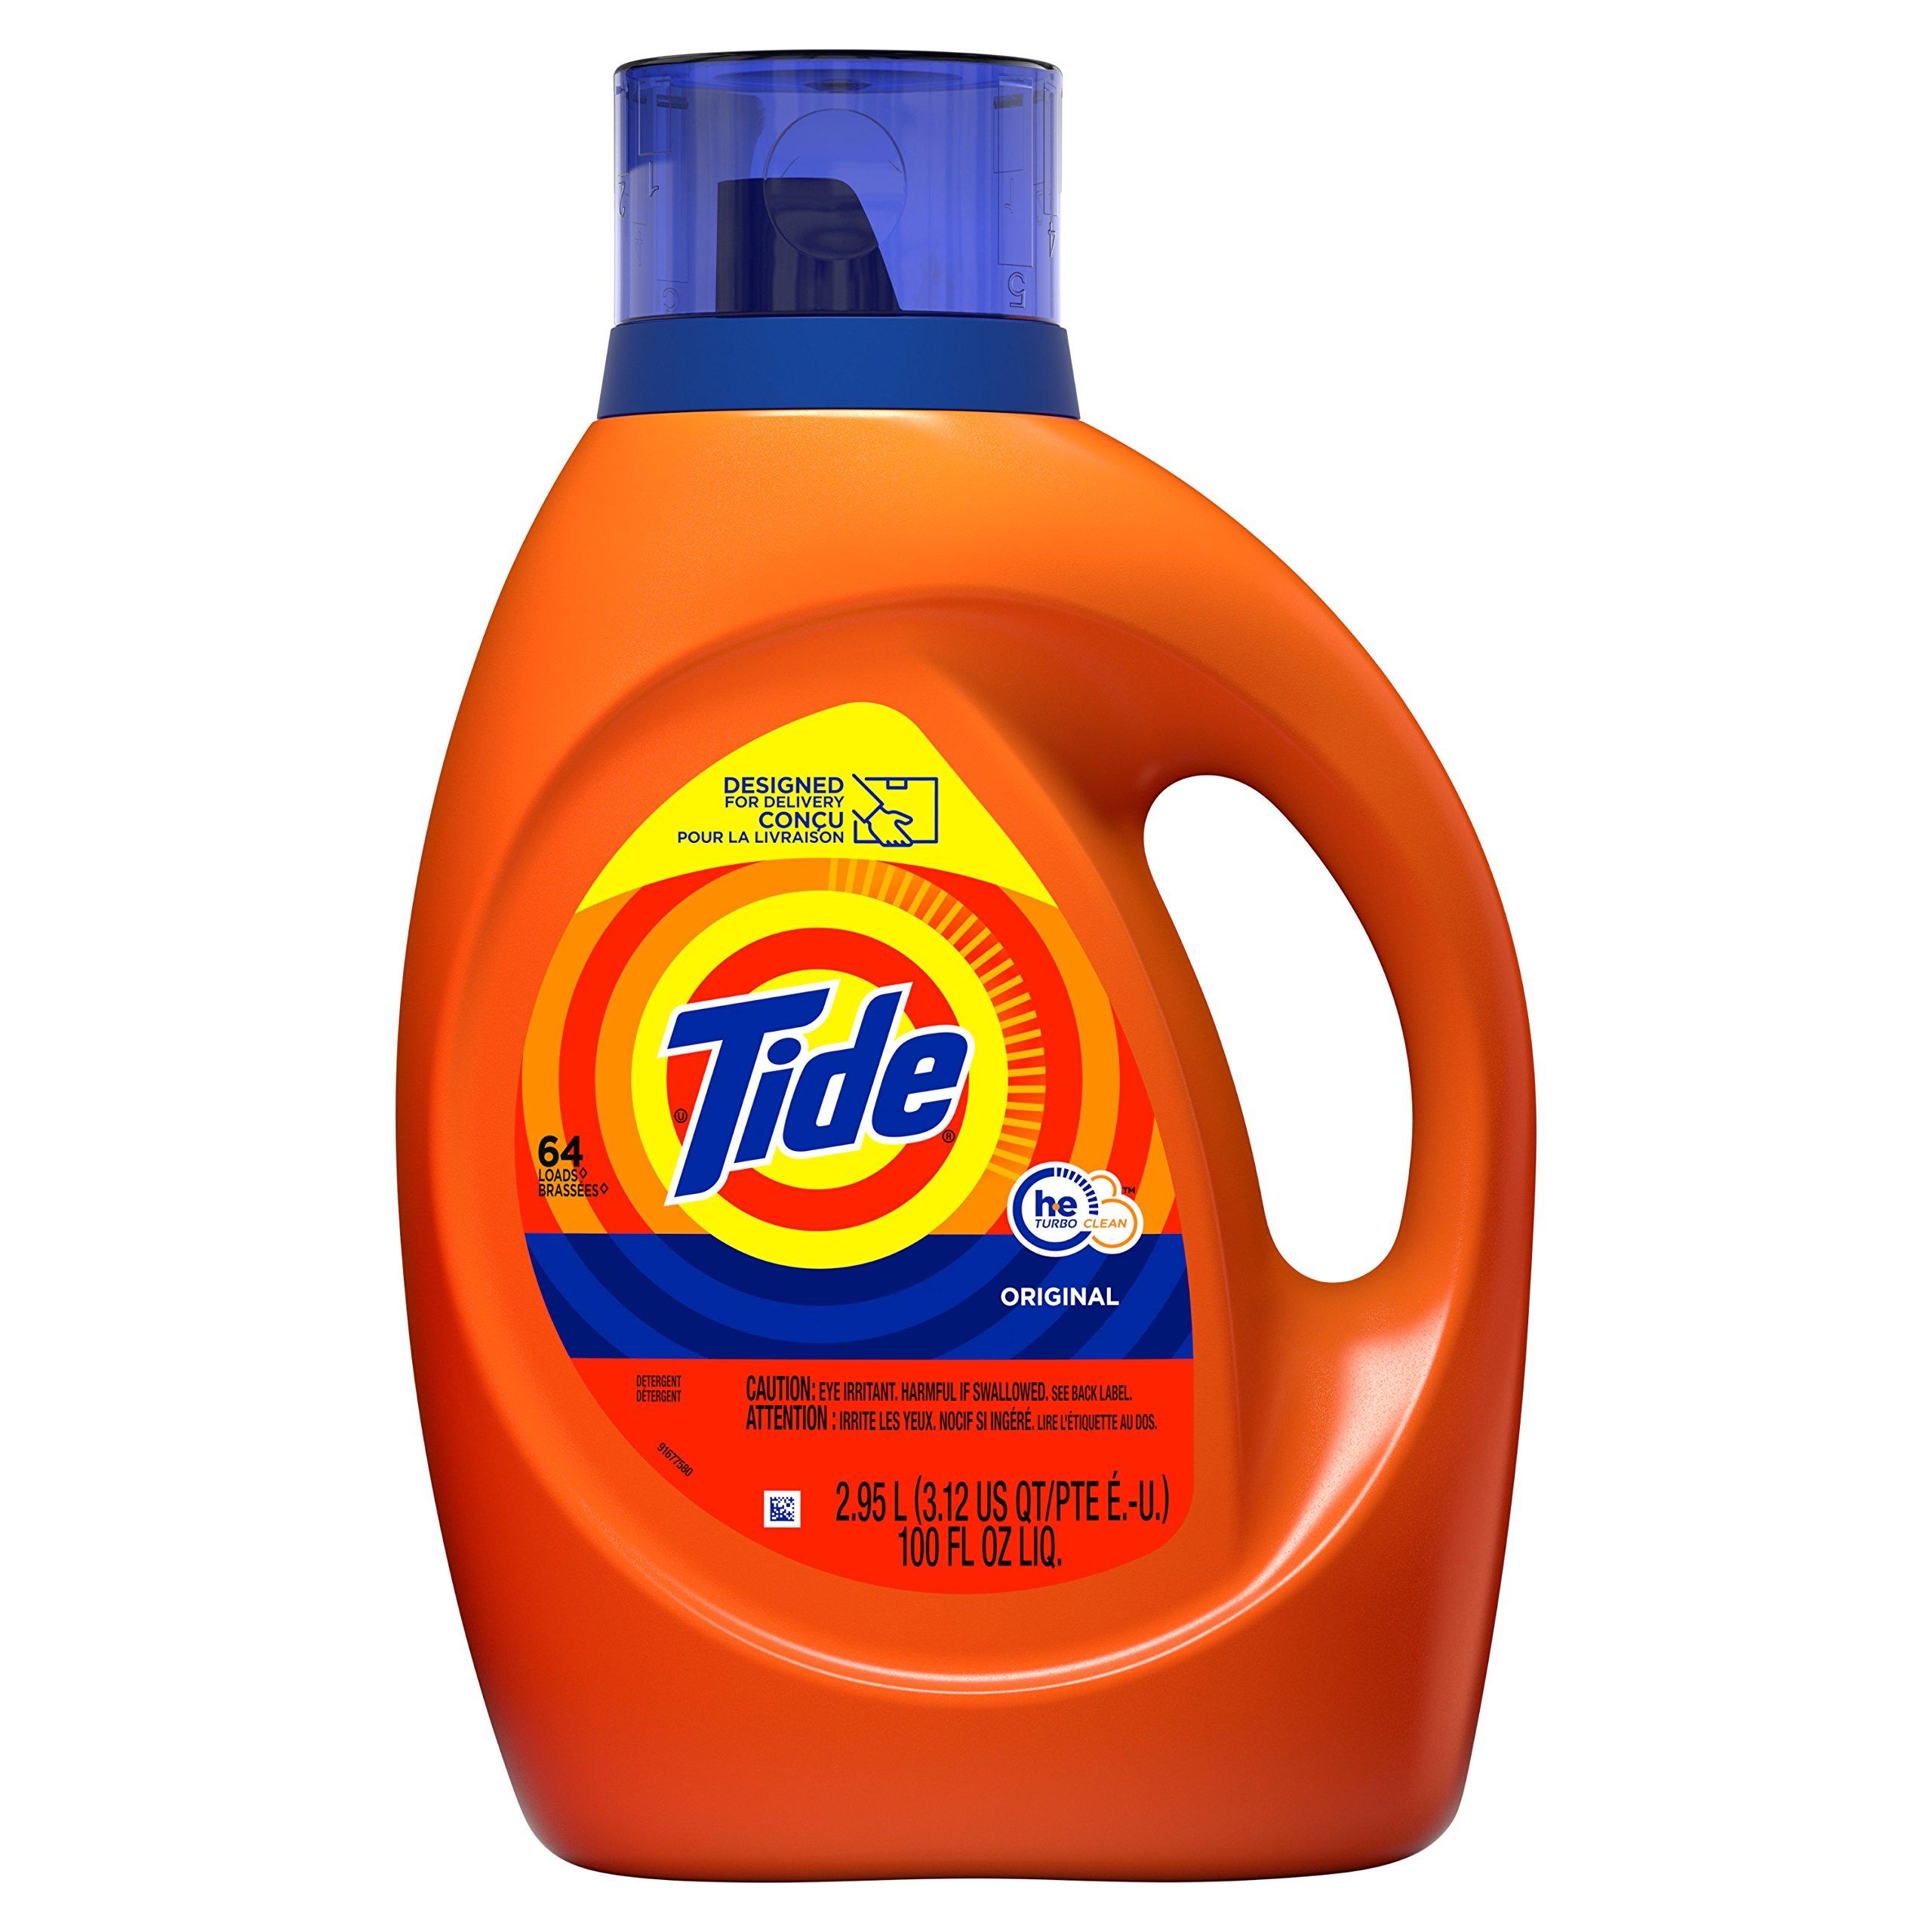 Tide Laundry Detergent Liquid, Original Scent, HE Turbo Clean, 100 oz, 64 Loads by Tide